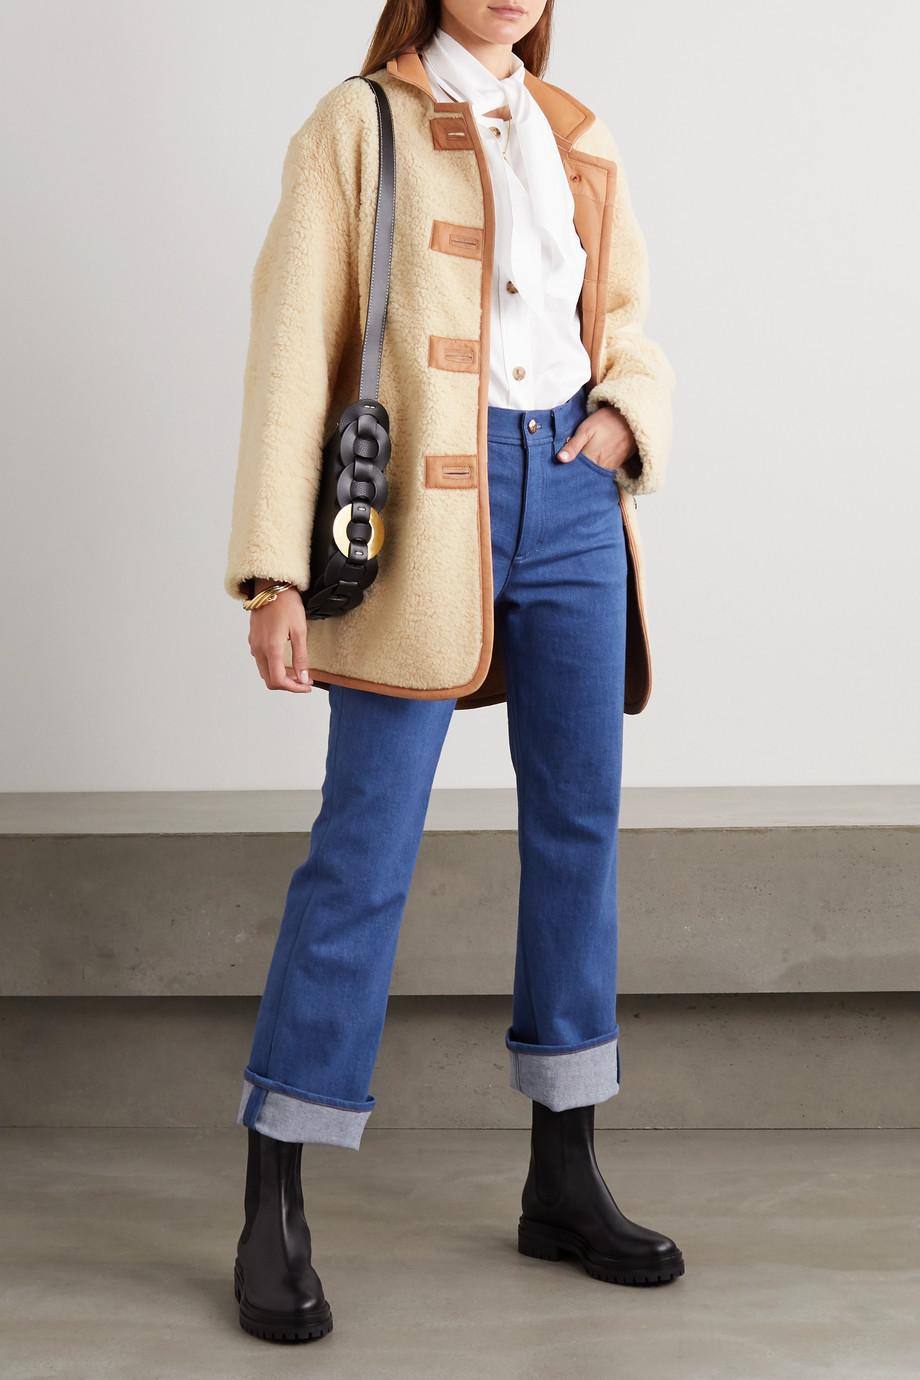 Chloé Jacke aus Shearling mit Lederbesatz